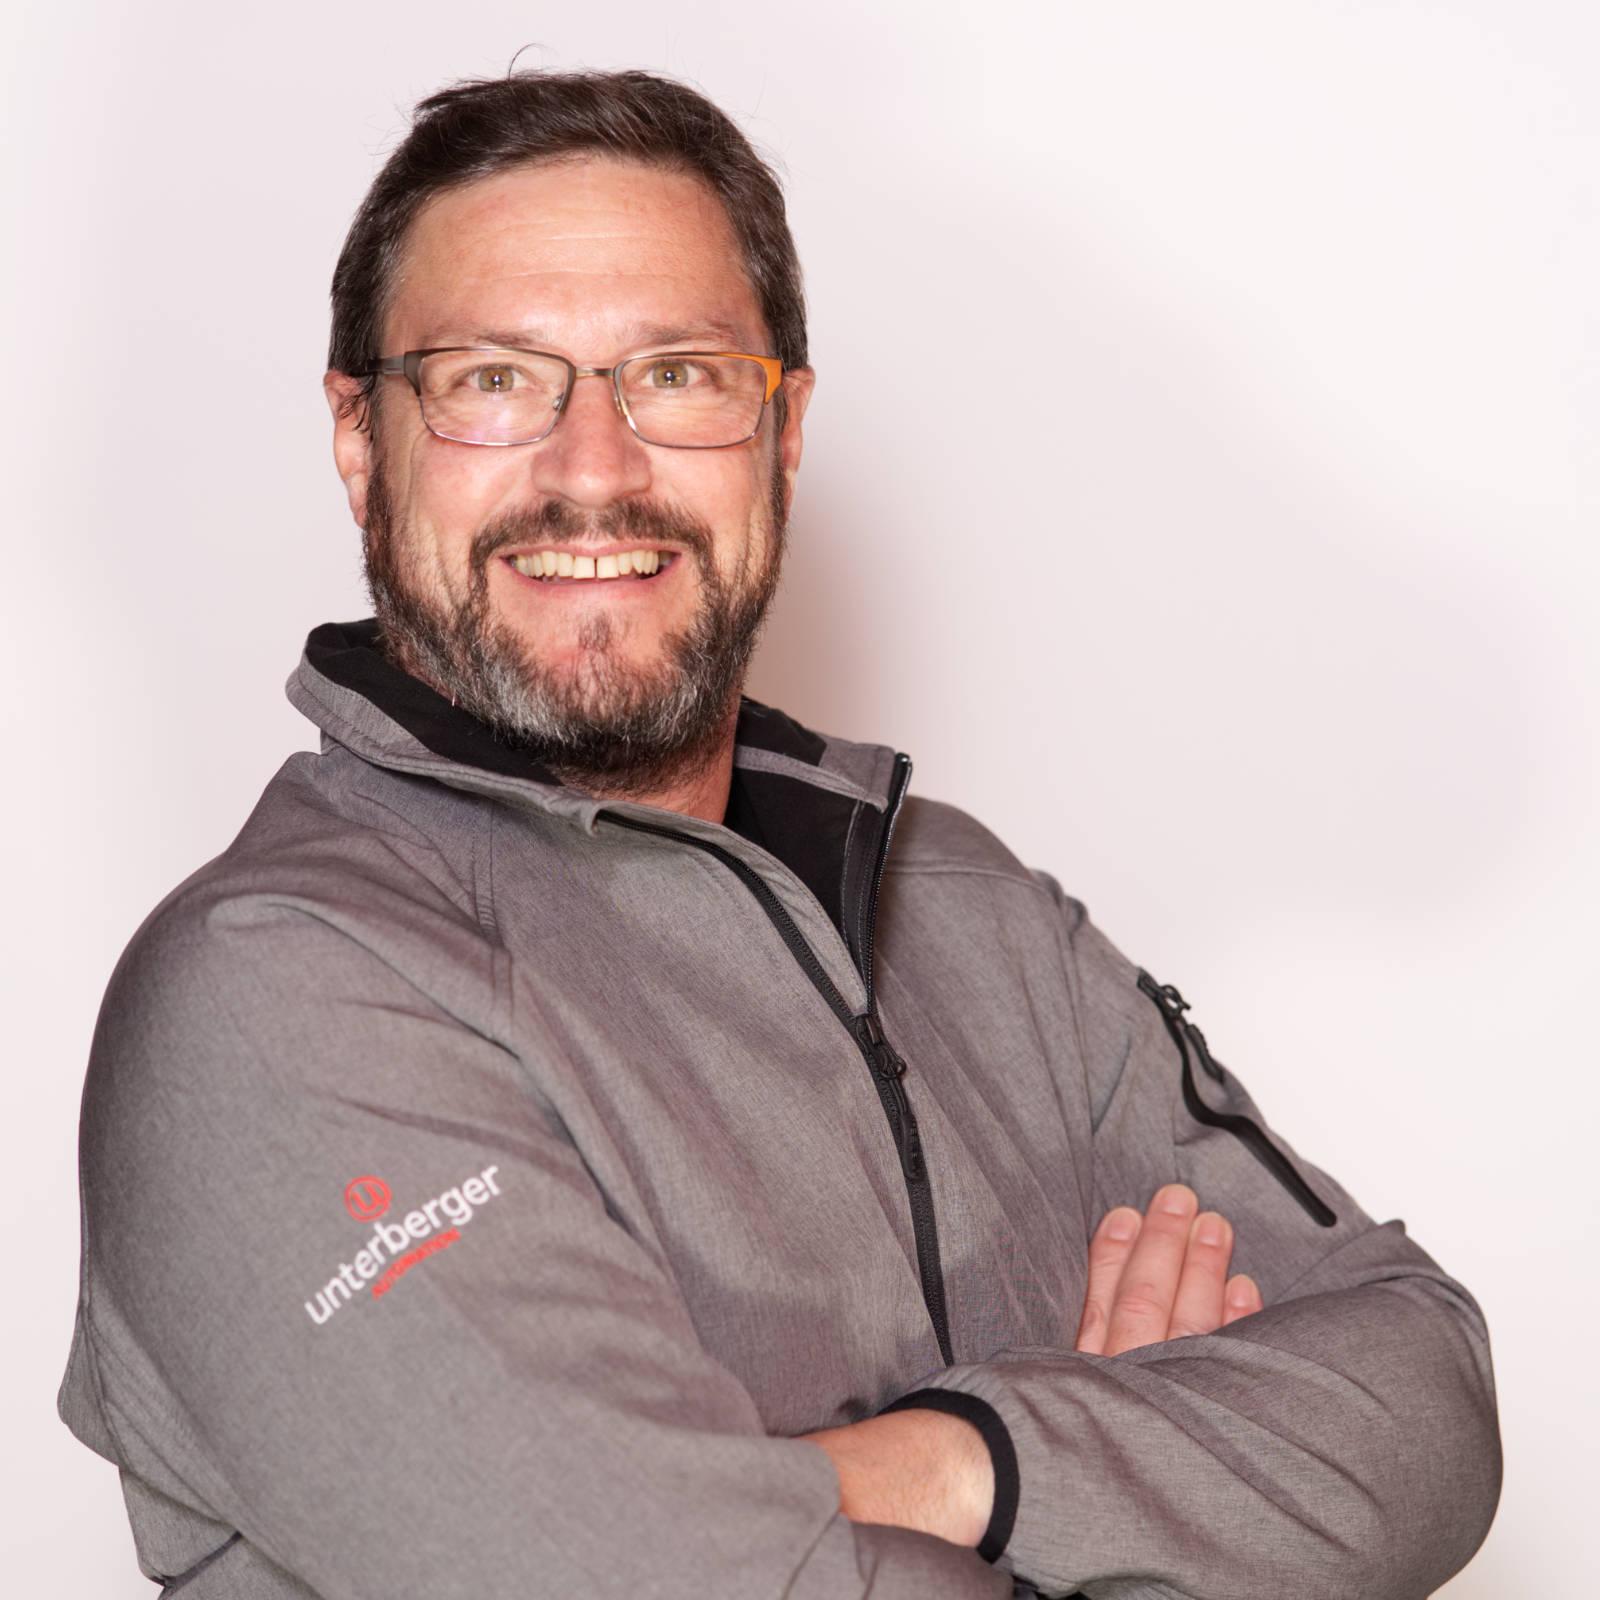 Markus-Bickel-Unterberger-GmbH